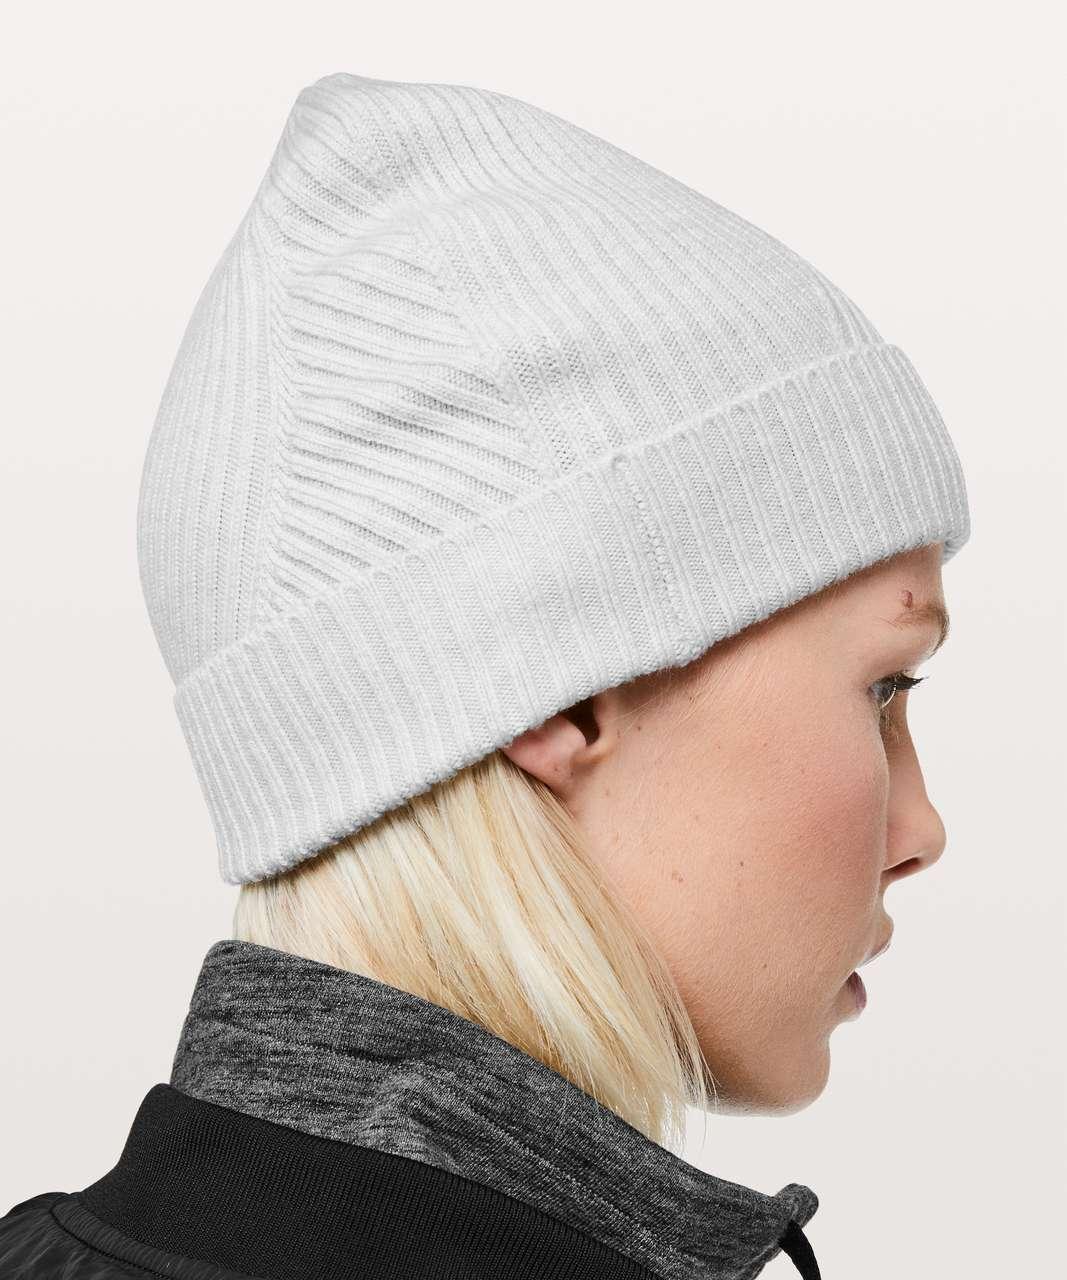 7d9b3bbad1085 Lululemon Twist Of Cozy Knit Beanie - Heathered Core Ultra Light Grey  (First Release)